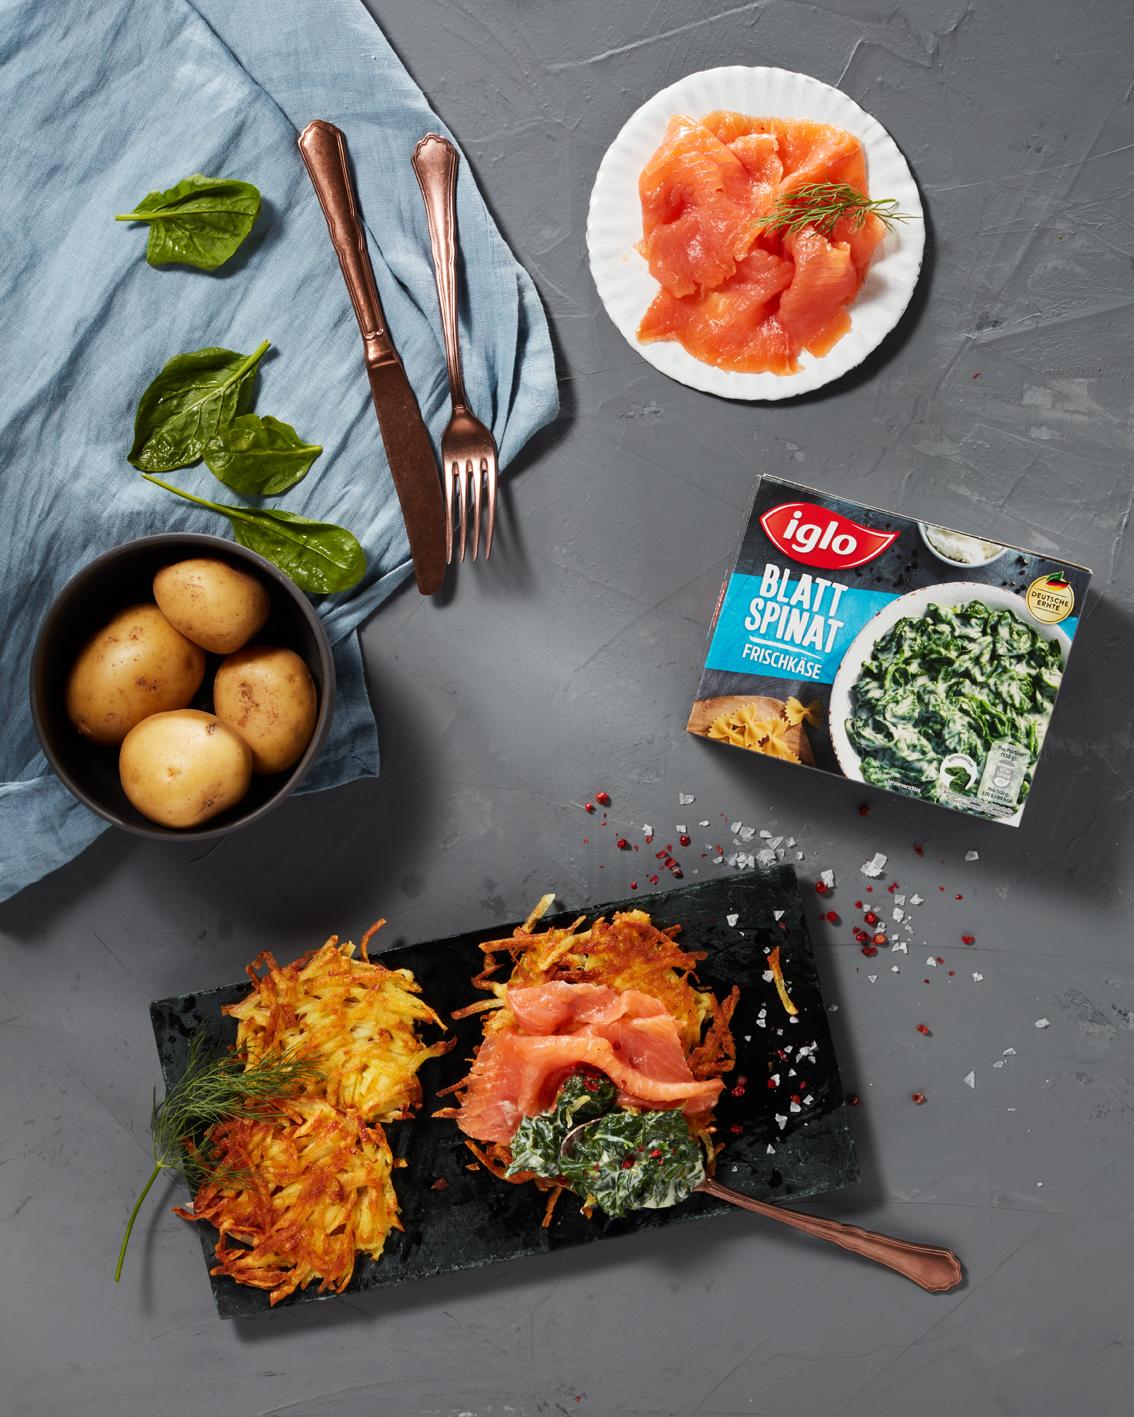 Food, Food-fotografie, Iglo, 3 Zutatenküche, Still-life, Hamburg, Christopher Shaw, Spinat, Lachs, Kartoffel, Rösti, Topshot